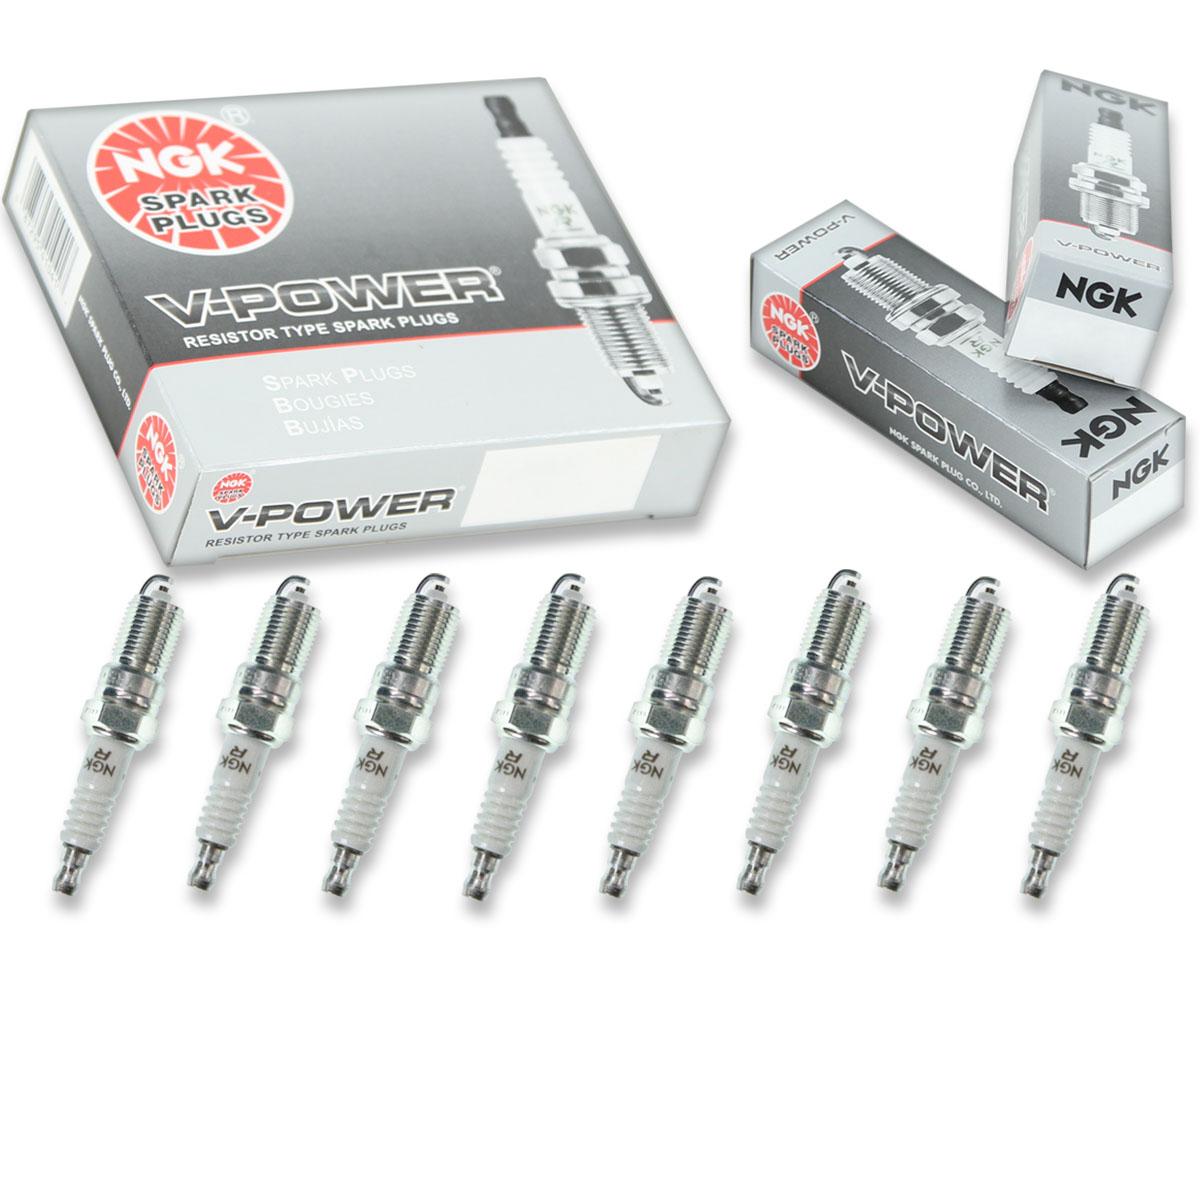 8 pcs NGK V-Power Spark Plugs for 2007-2010 Cadillac STS 4.6L V8 4.6L nc